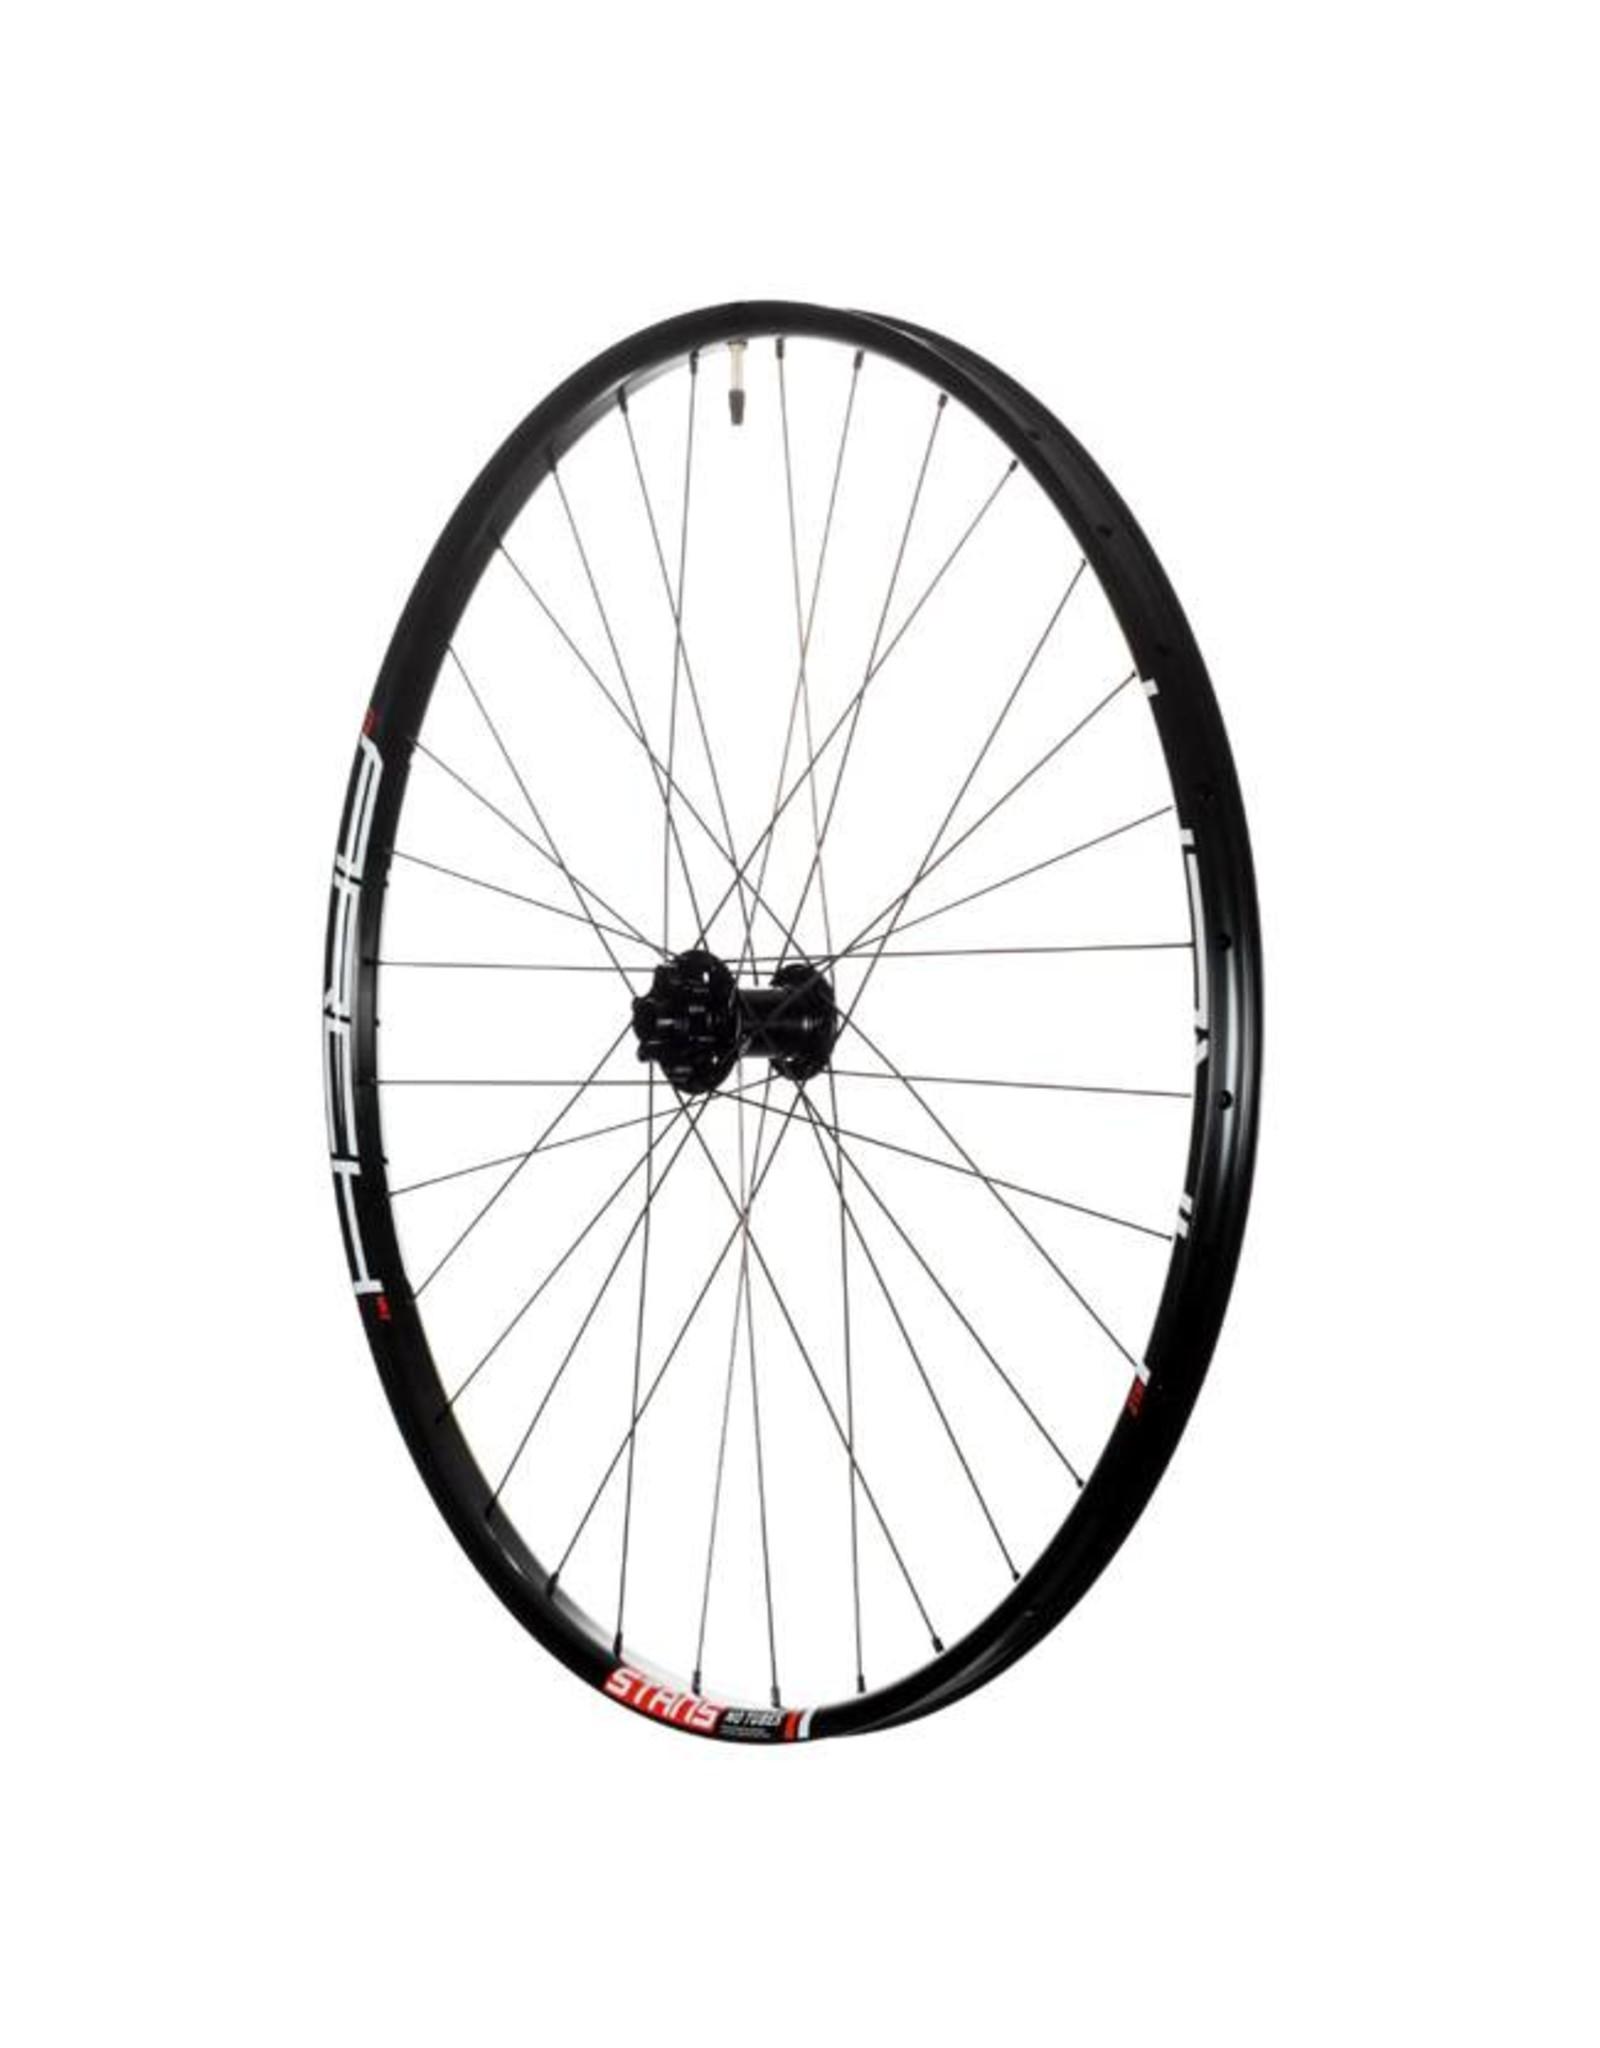 "Stan's No Tubes Stan's No Tubes Arch MK3 Rear Wheel: 27.5"" Alloy, 12 x 148mm Boost, 6- Bolt Disc, SRAM XD, Black"